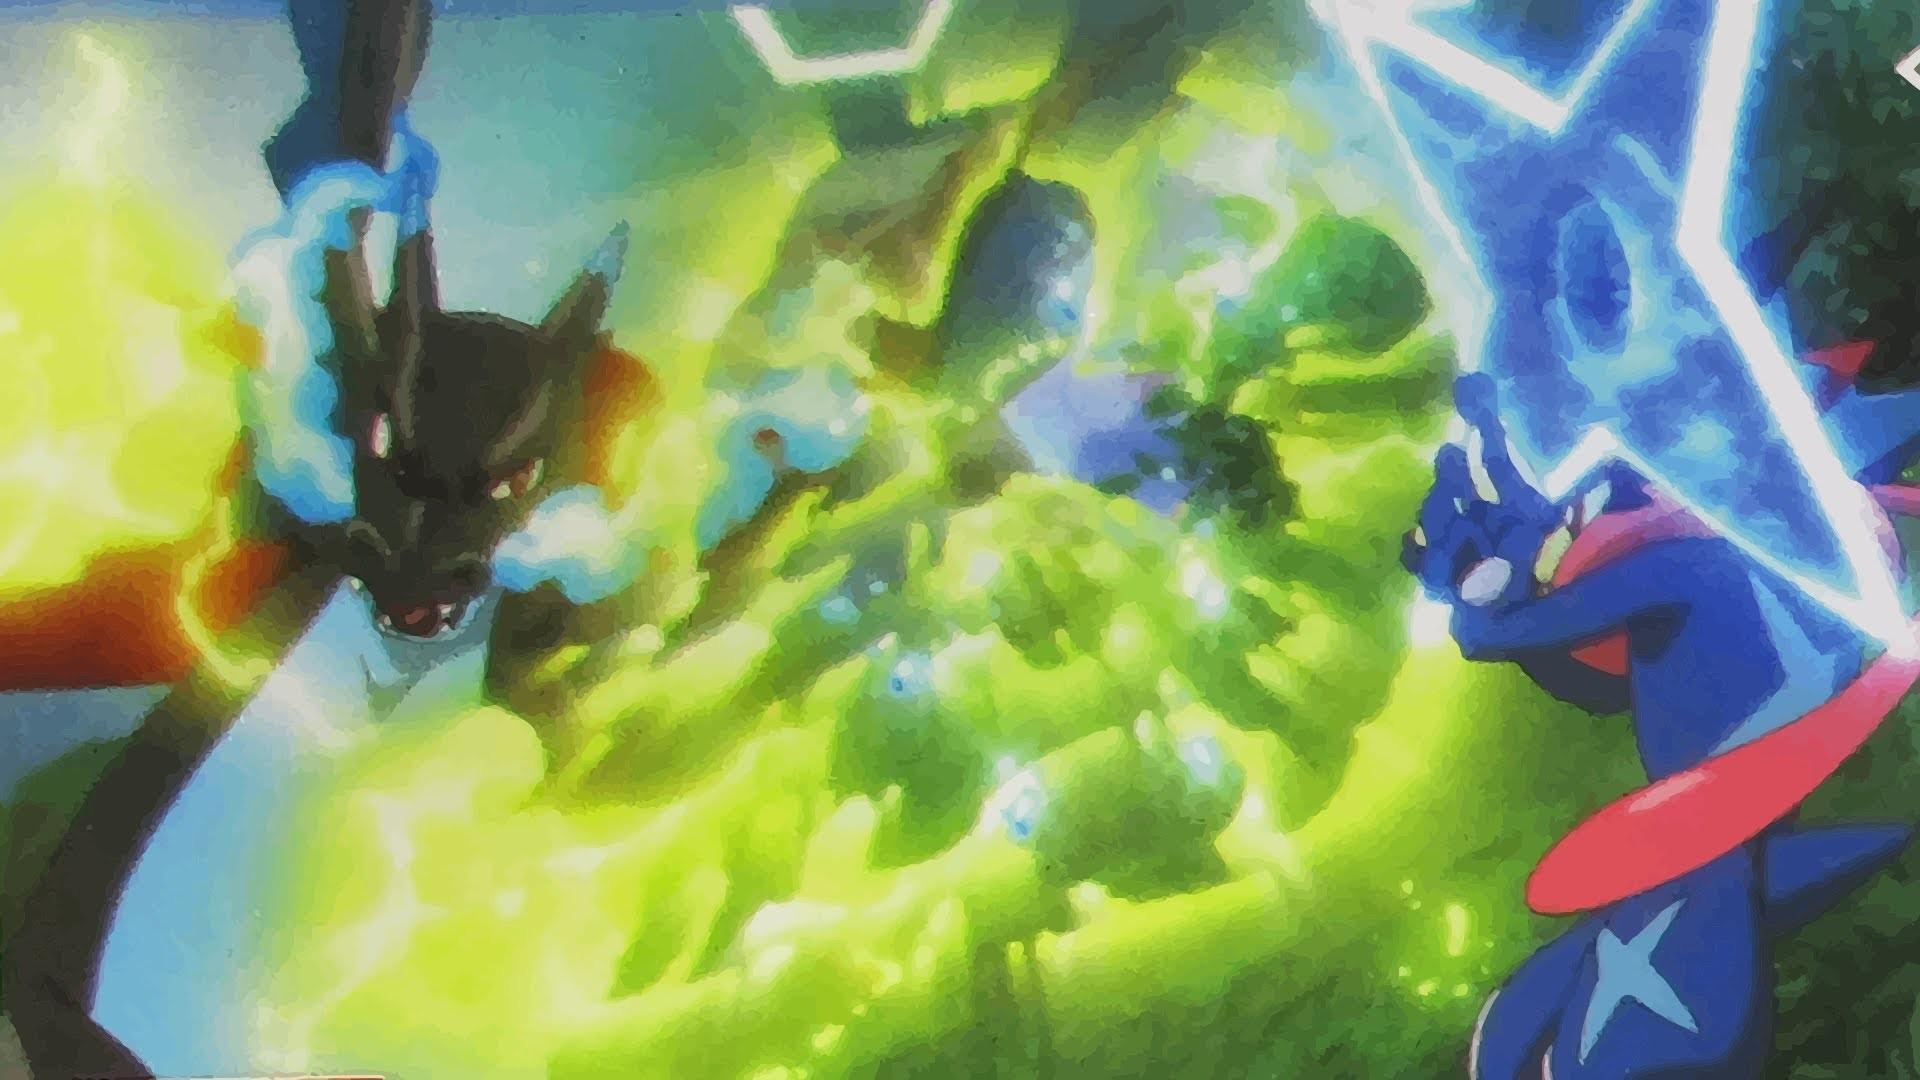 「AMV」POKEMON XYZ ASH VS ALAN (Kalos League) (Final) Greninja vs Mega  Charizard X